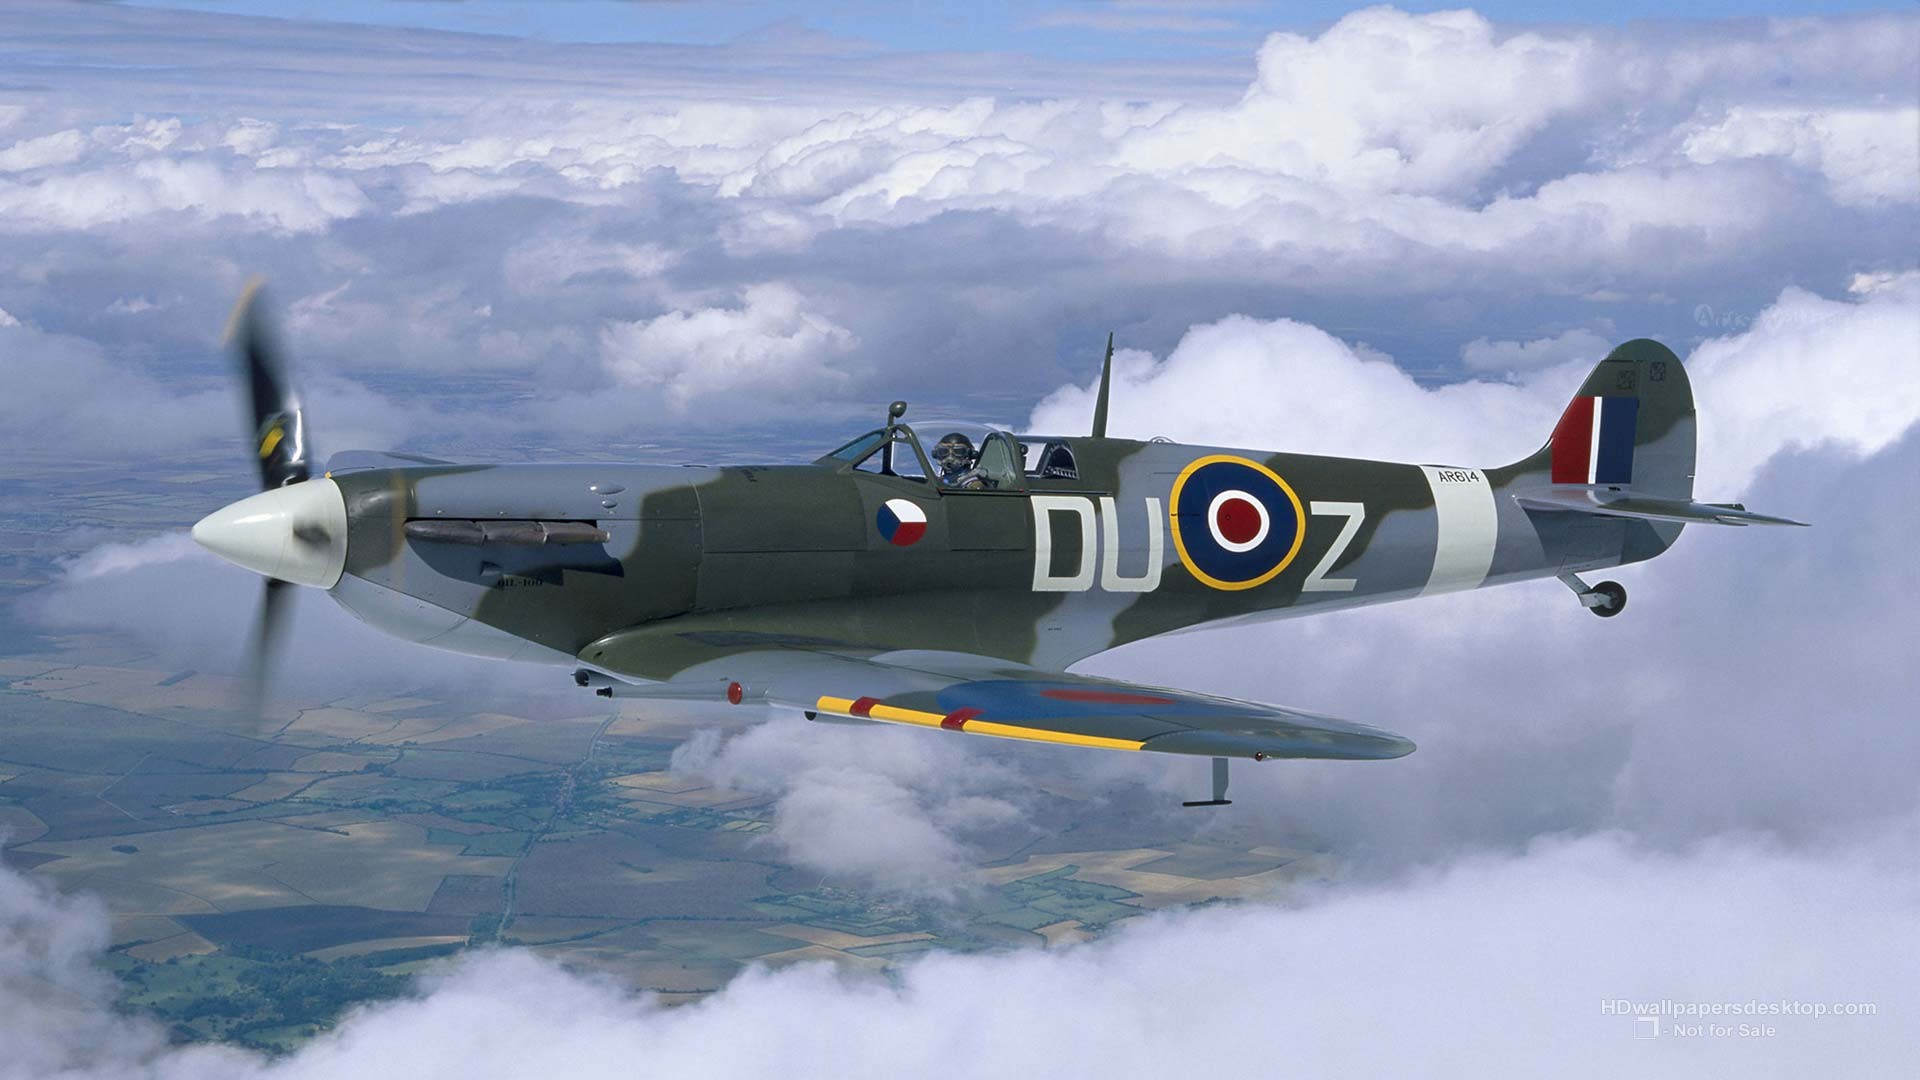 War Planes Wallpaper (74+ Images